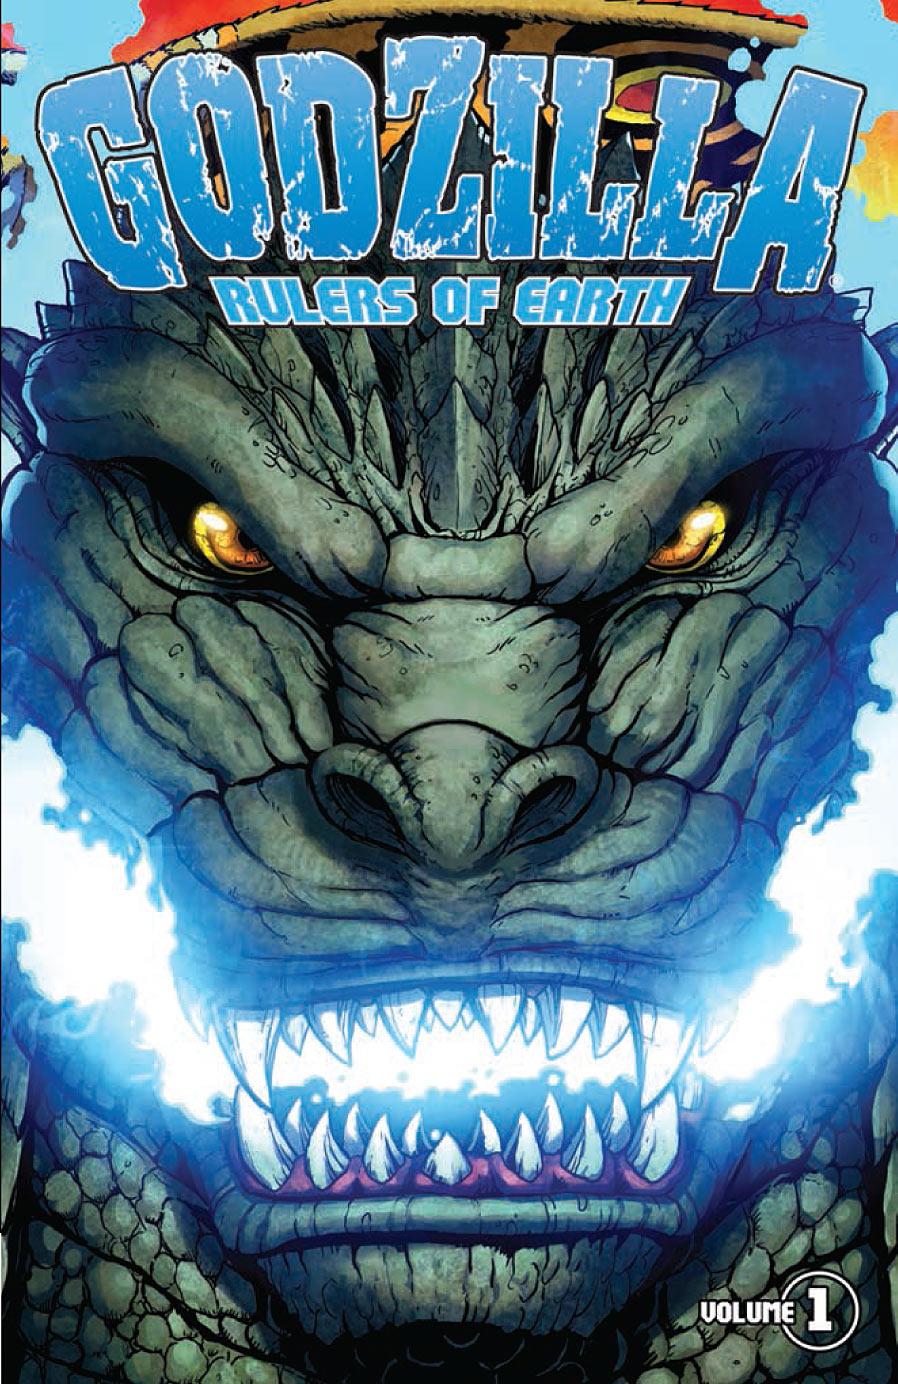 Godzilla Rulers of Earth Vol. 1 TP